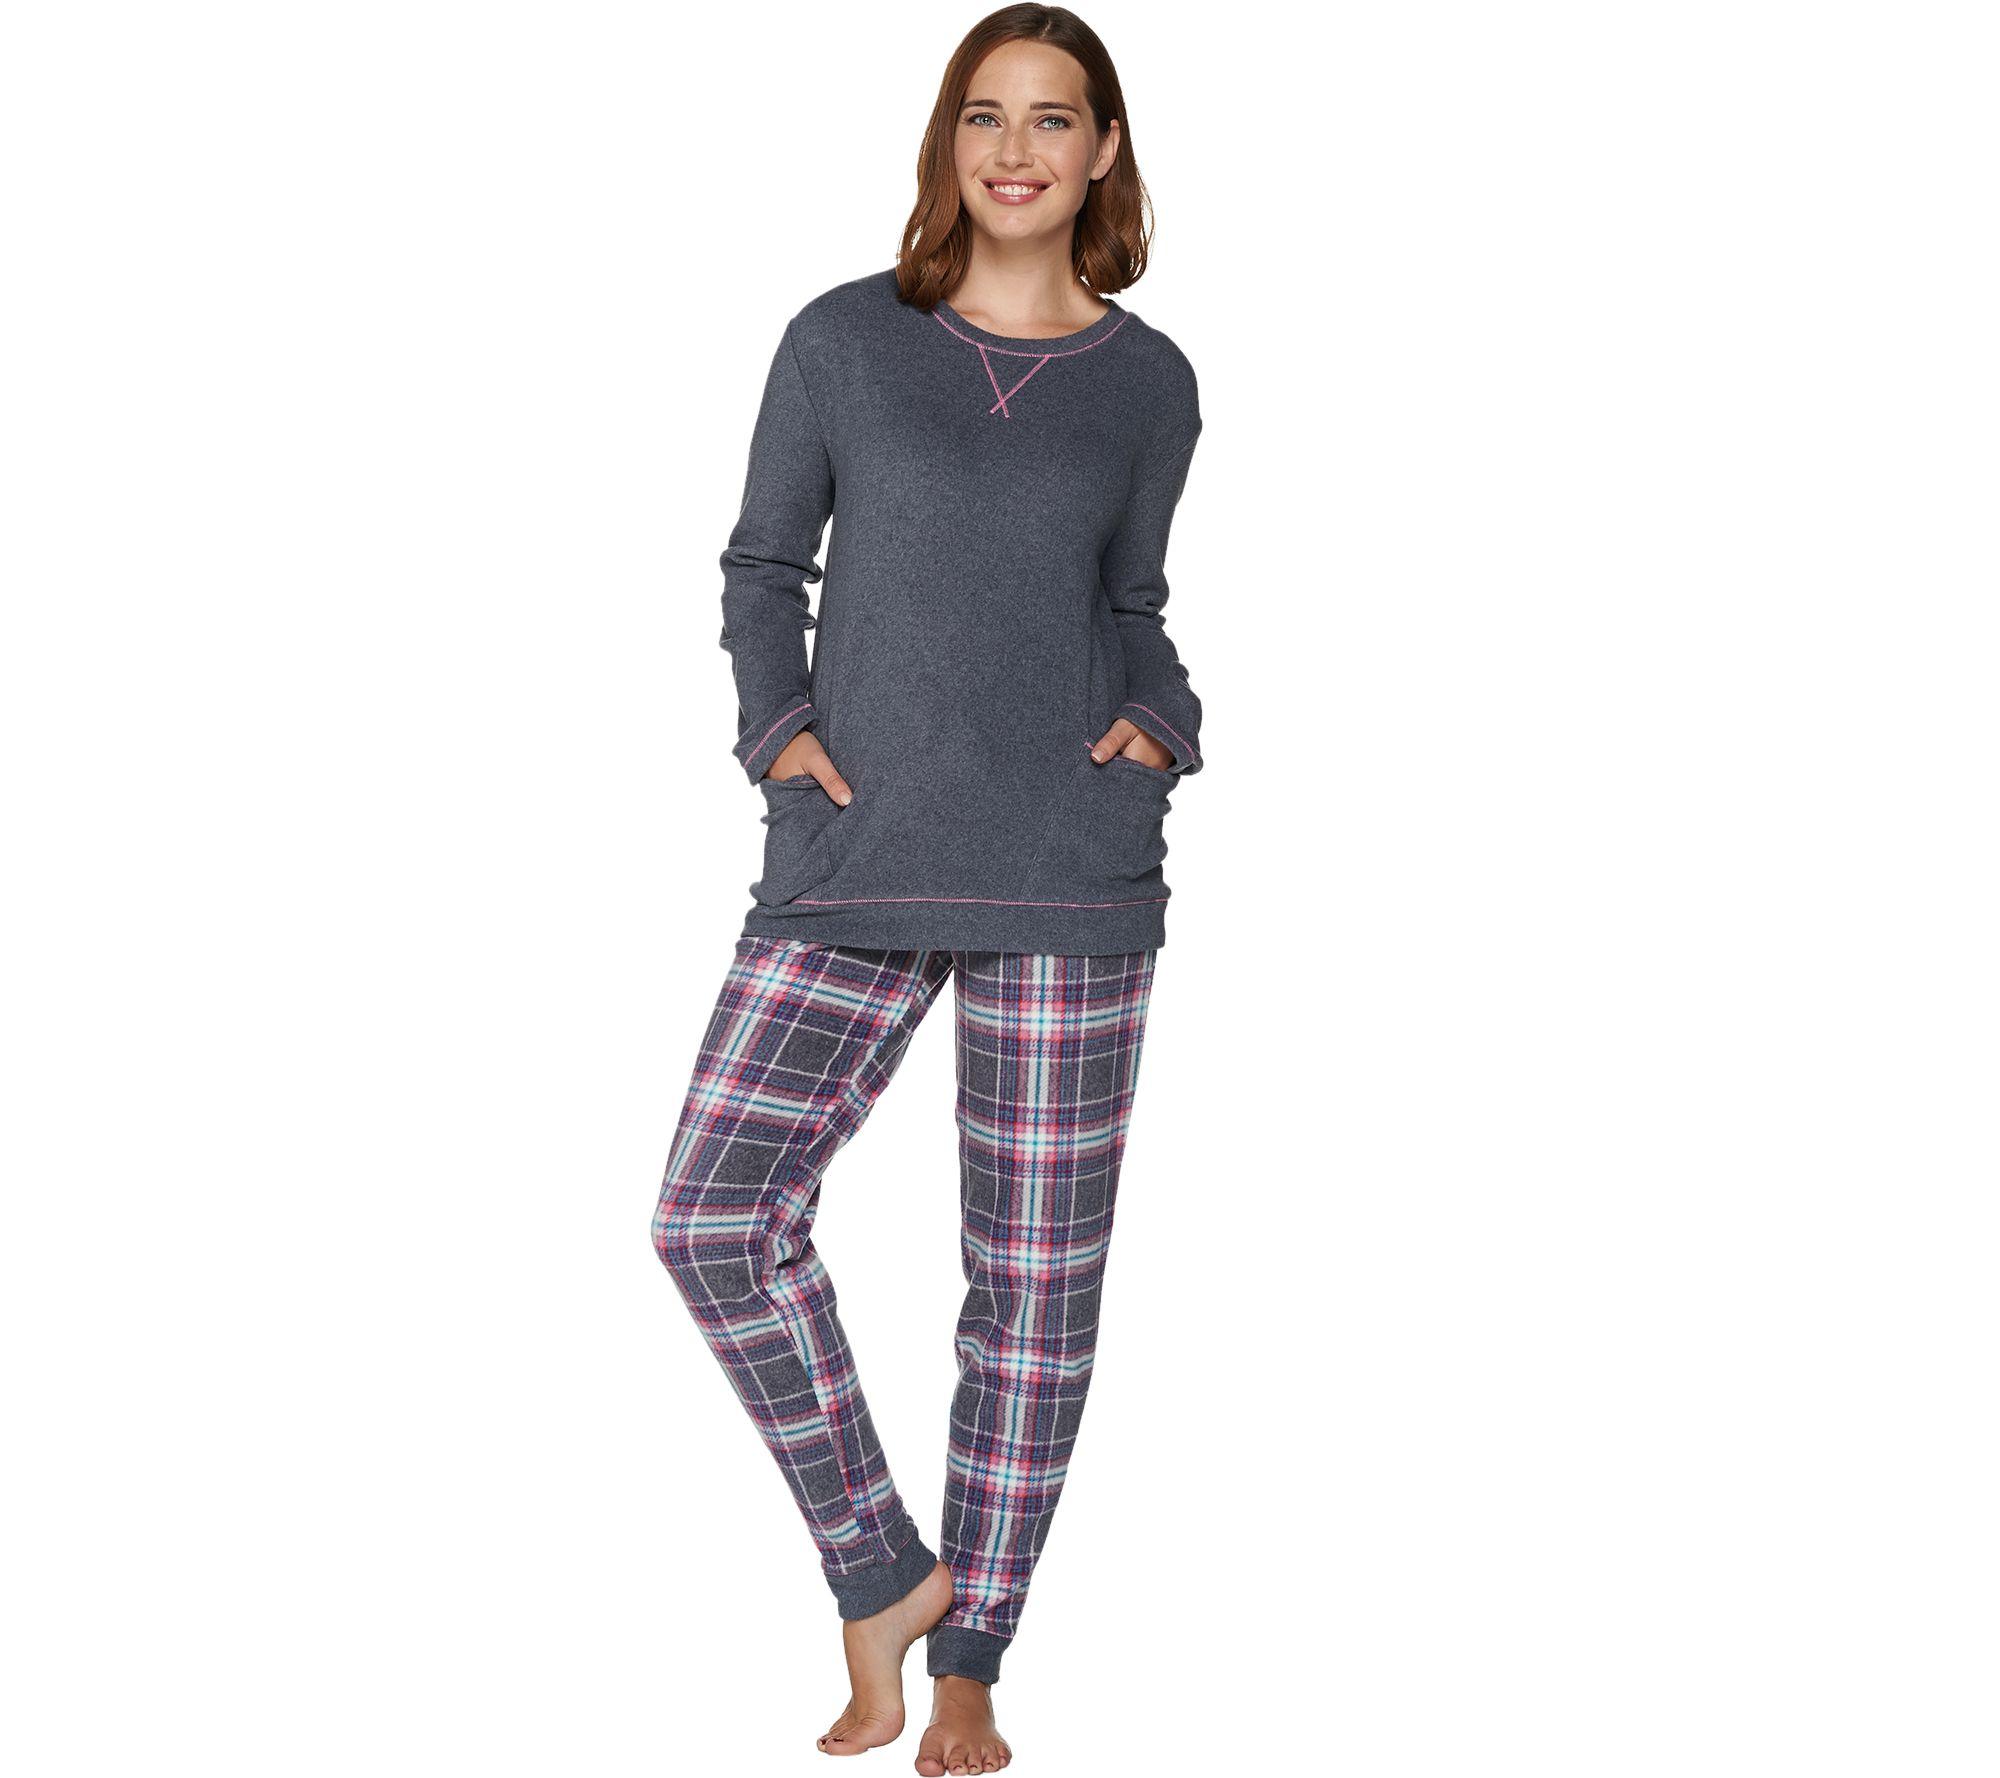 8d9d3280ad8 Cuddl Duds Stretch Fleece Novelty Pajama Set - Page 1 — QVC.com